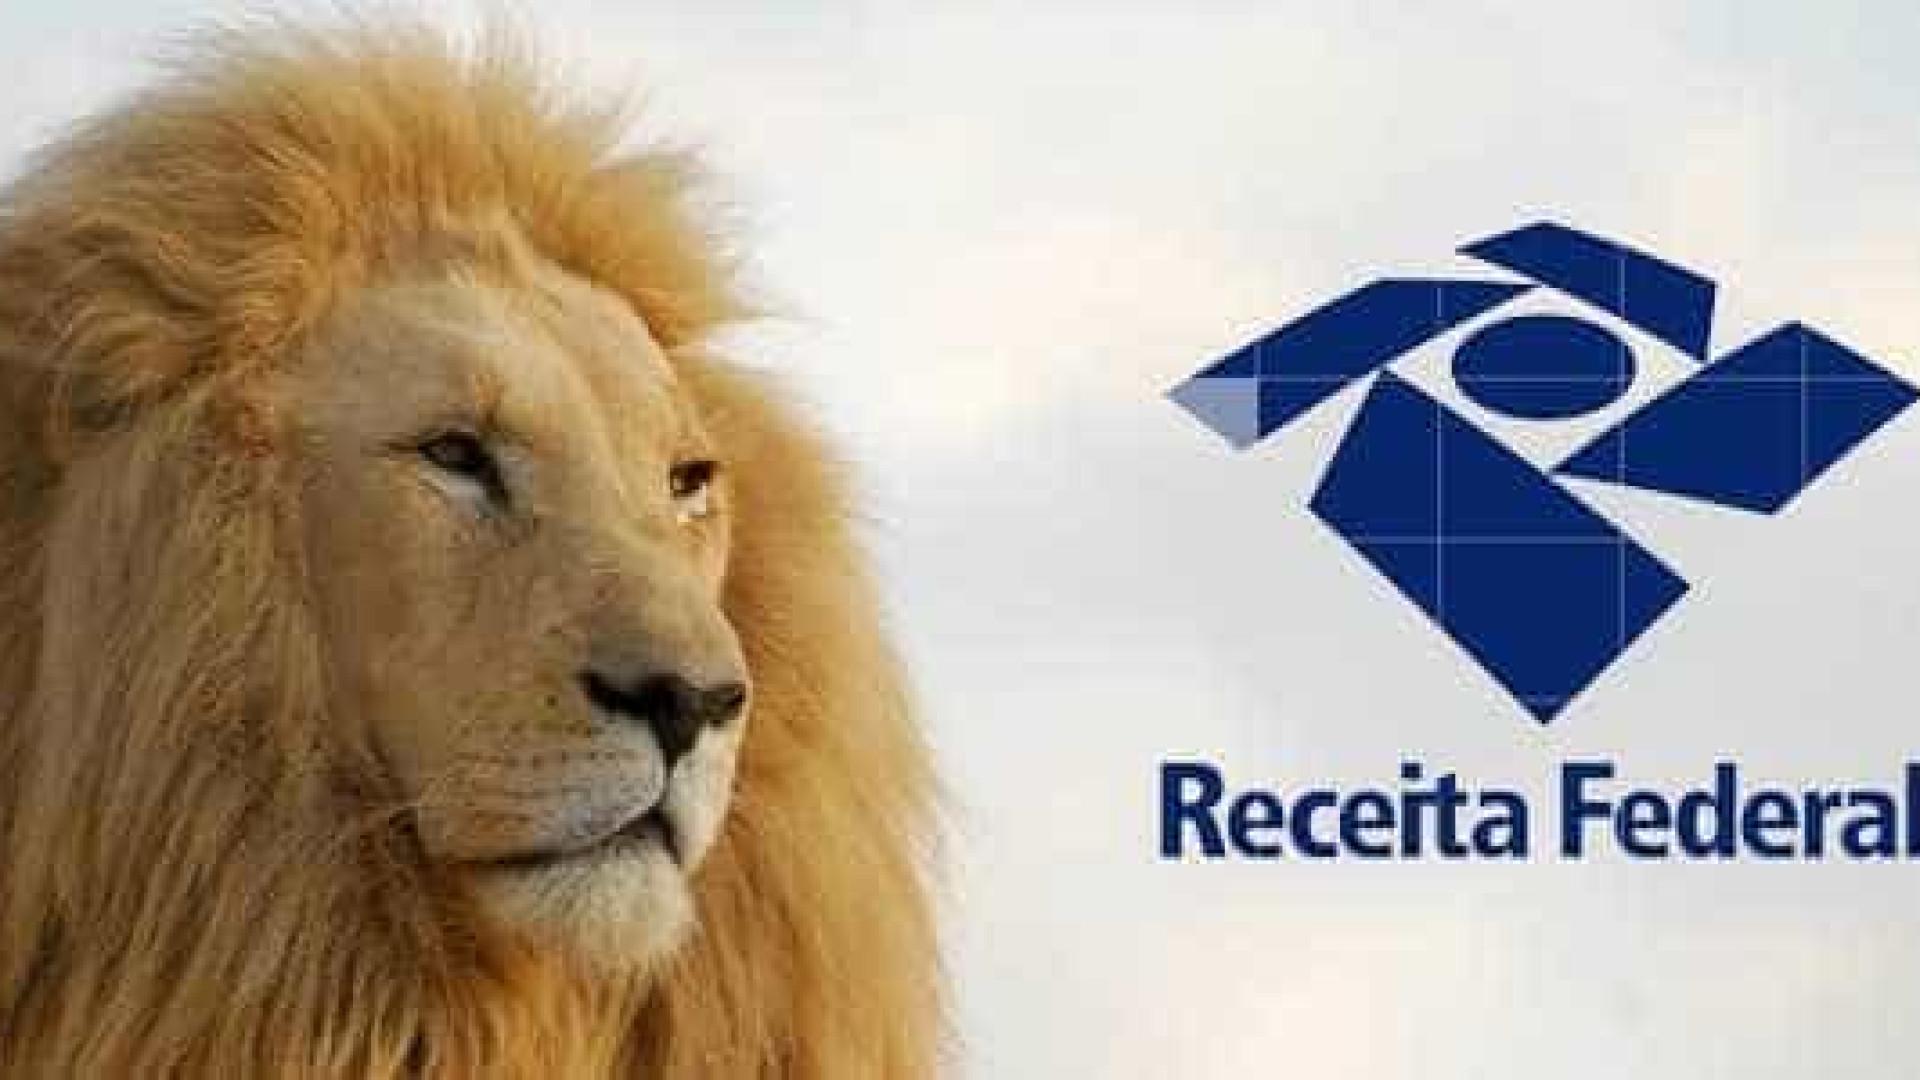 Refeita Federal anuncia medidas  para recuperar tributos indevidos